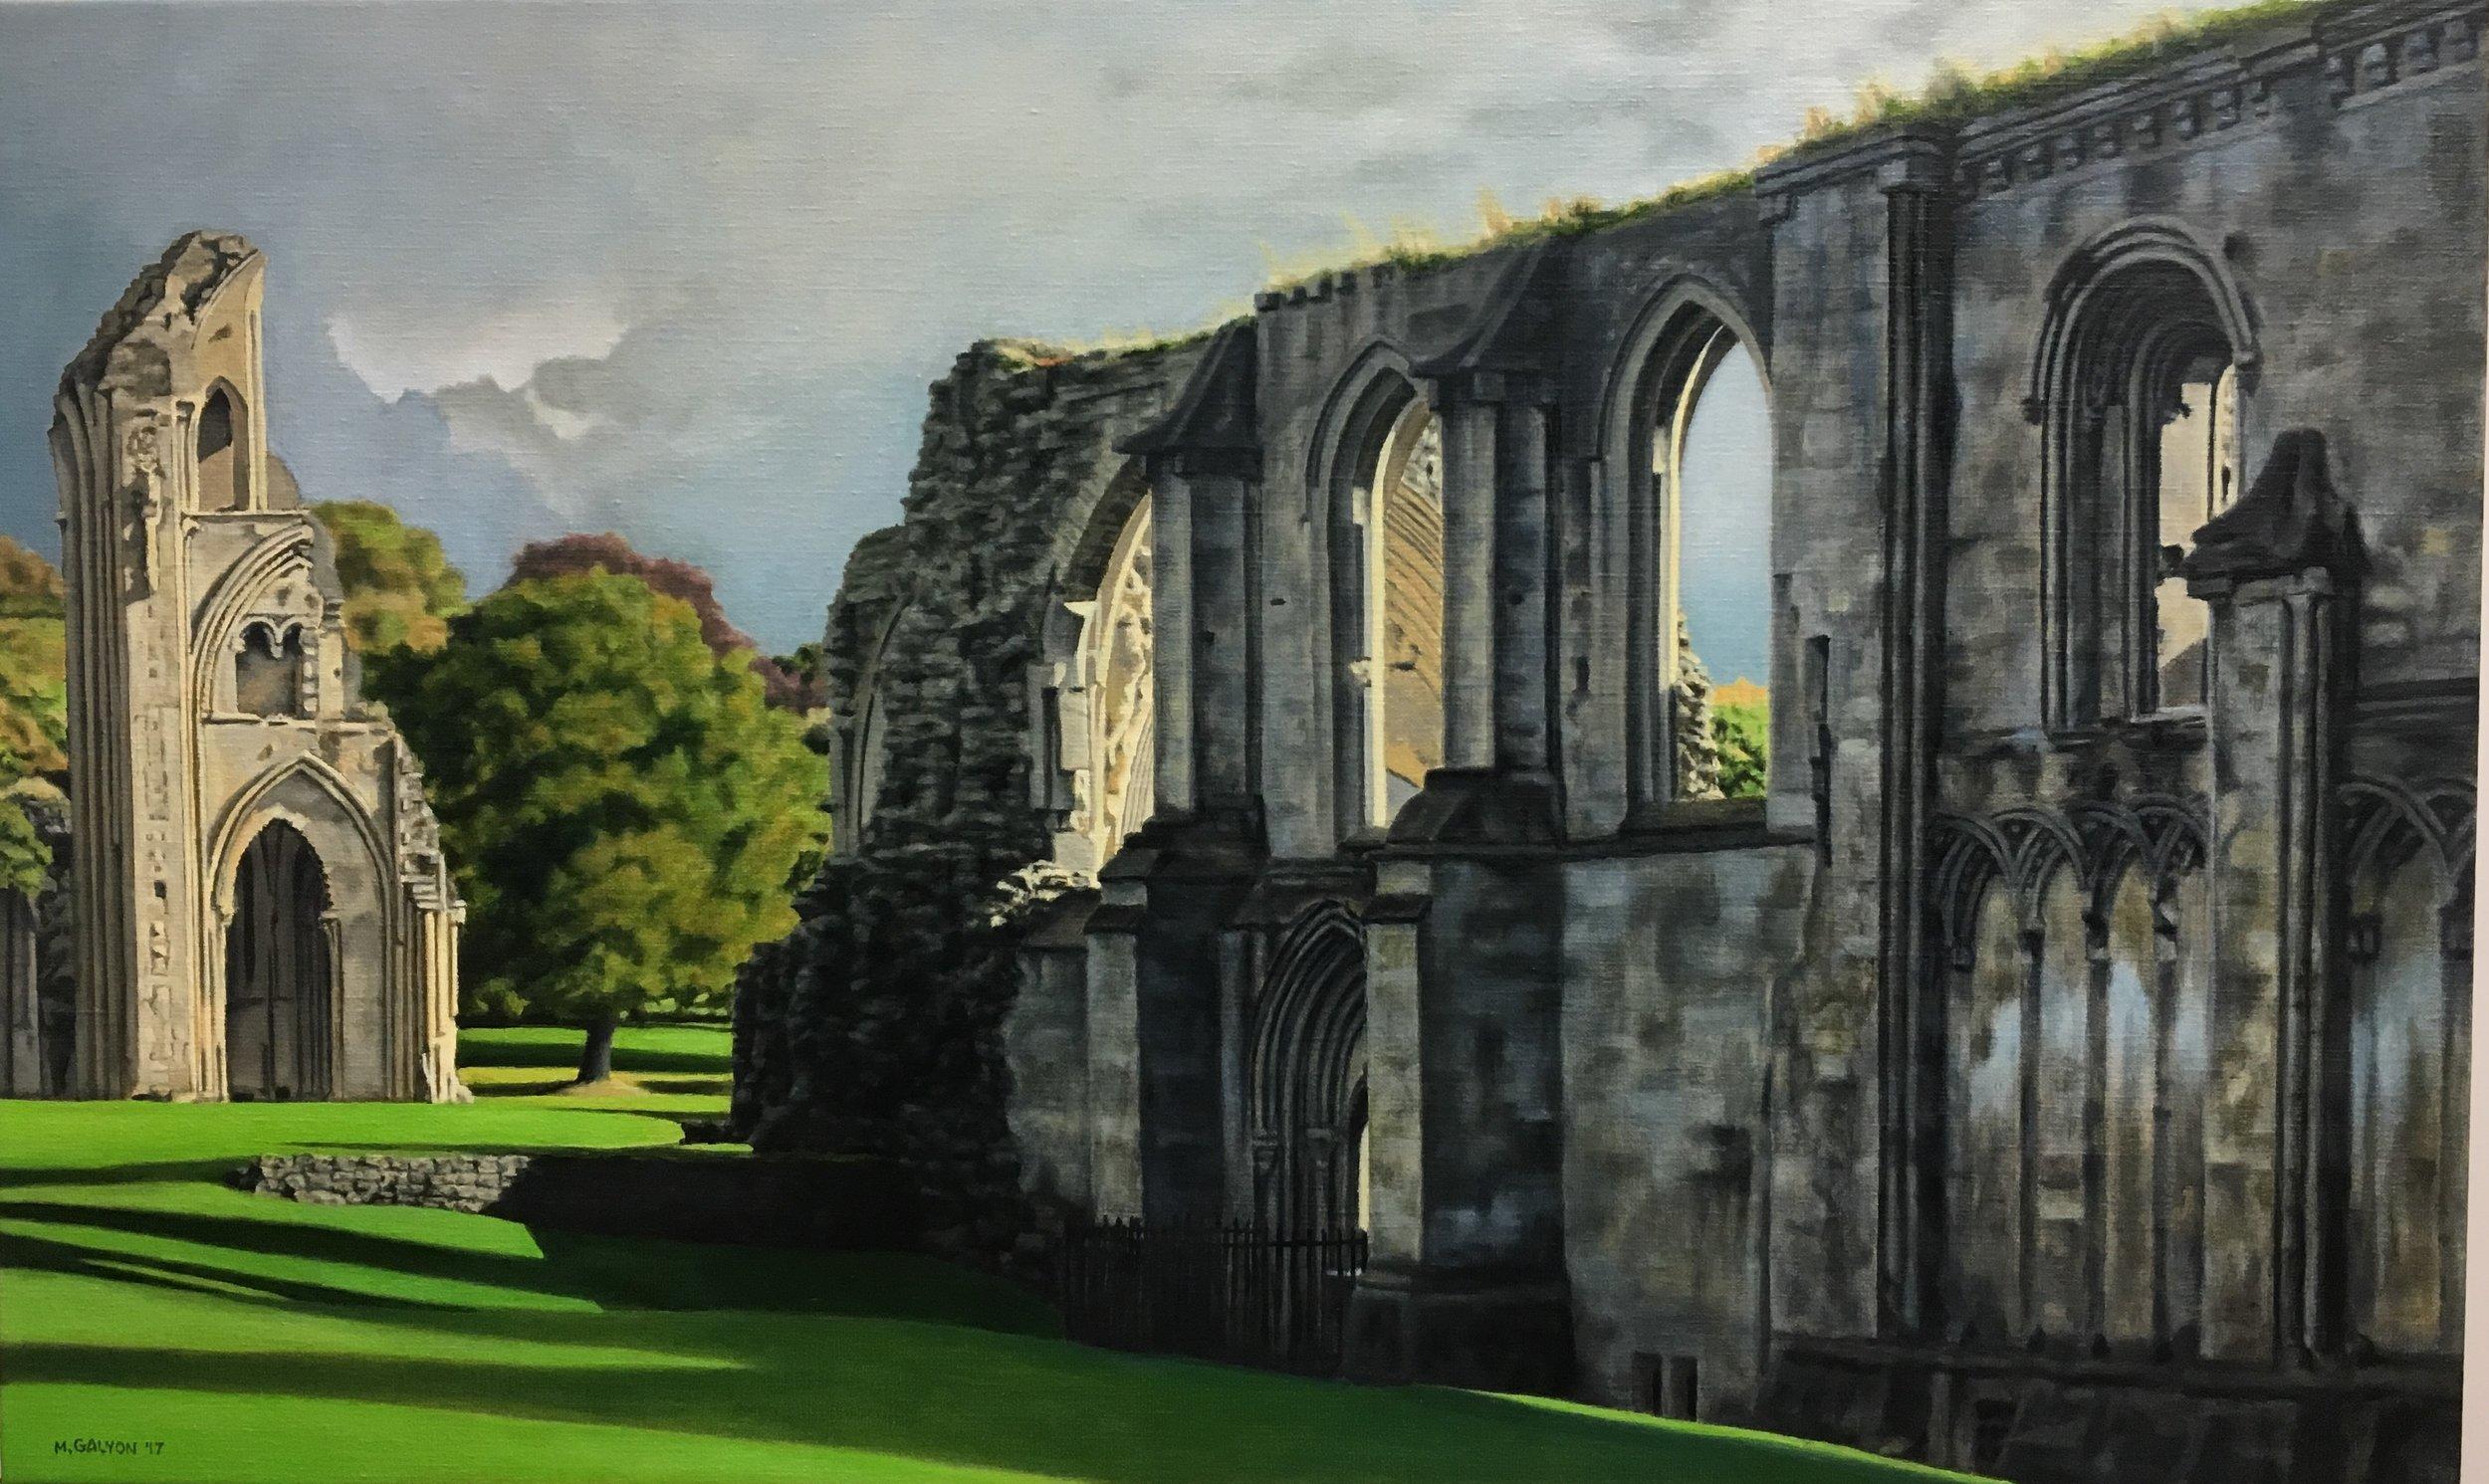 Glastonbury Abbey Ruins, England